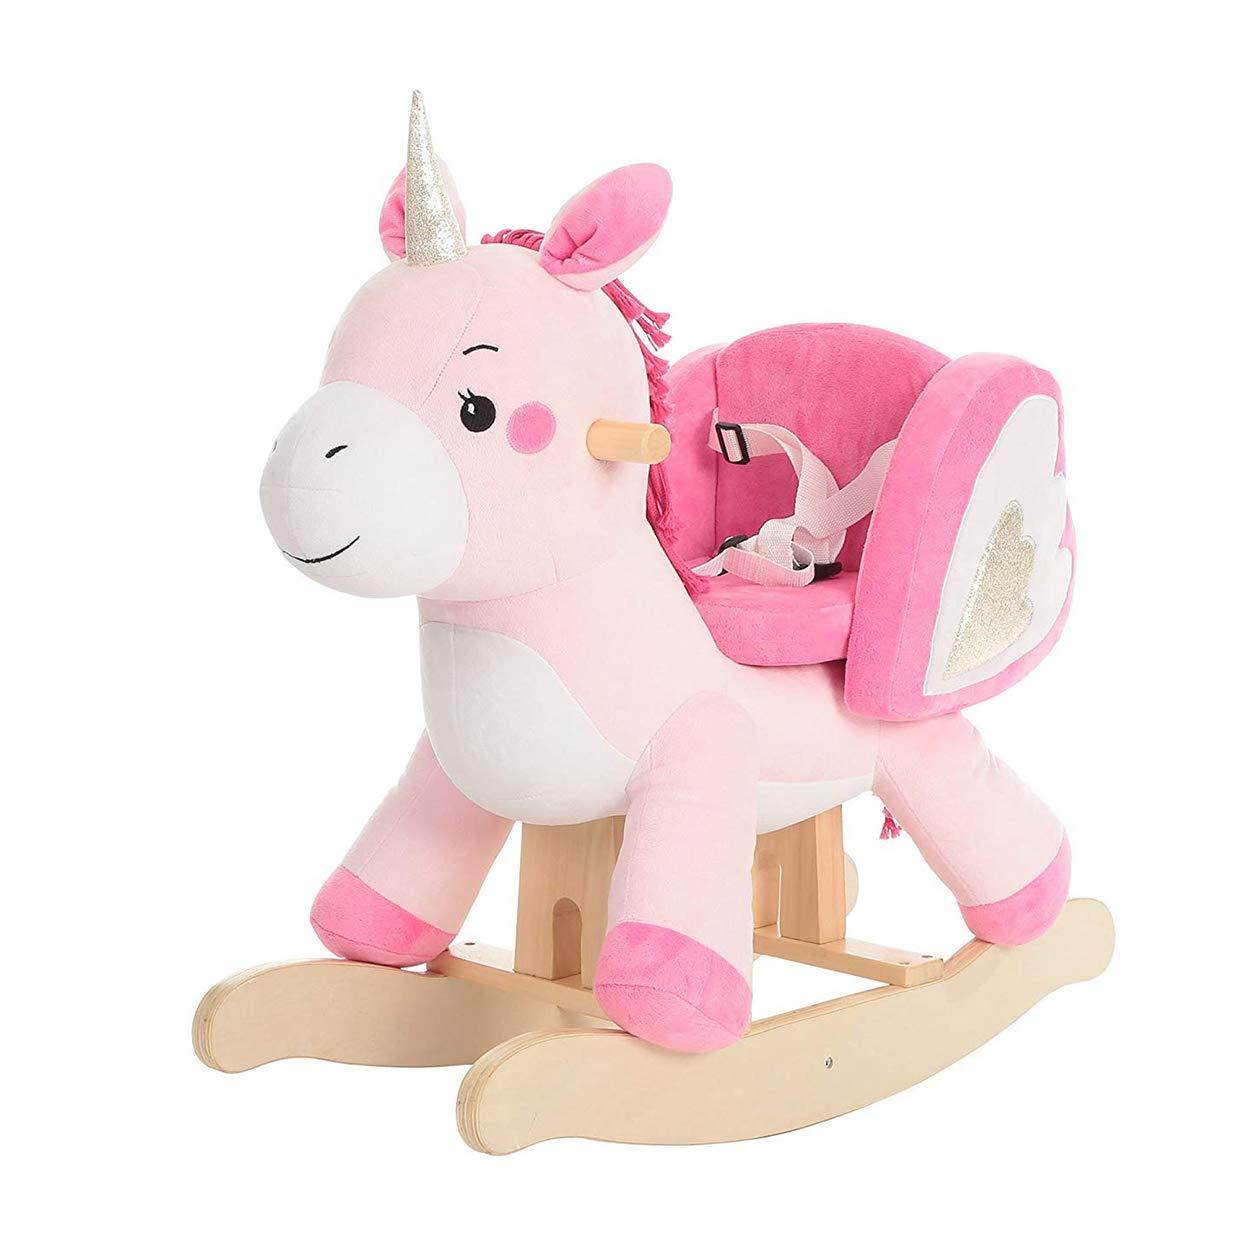 Wooden Rocking Horse, Kids Unicorn Rocker Ride On, Plush Stuffed Animal Rocker Toy for Kid 1-3 Years